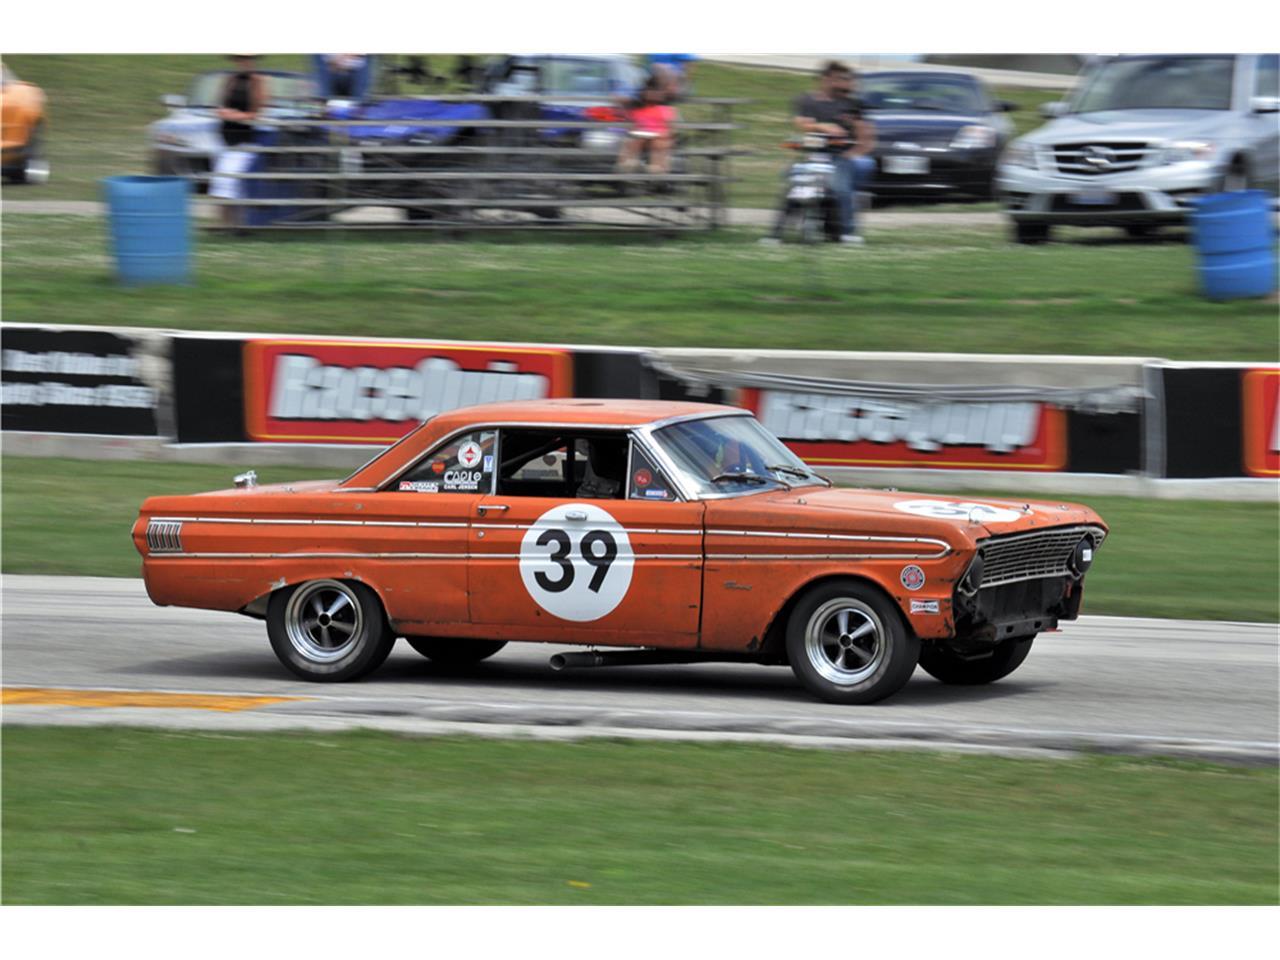 1964 Ford Falcon For Sale Classiccarscom Cc 1170451